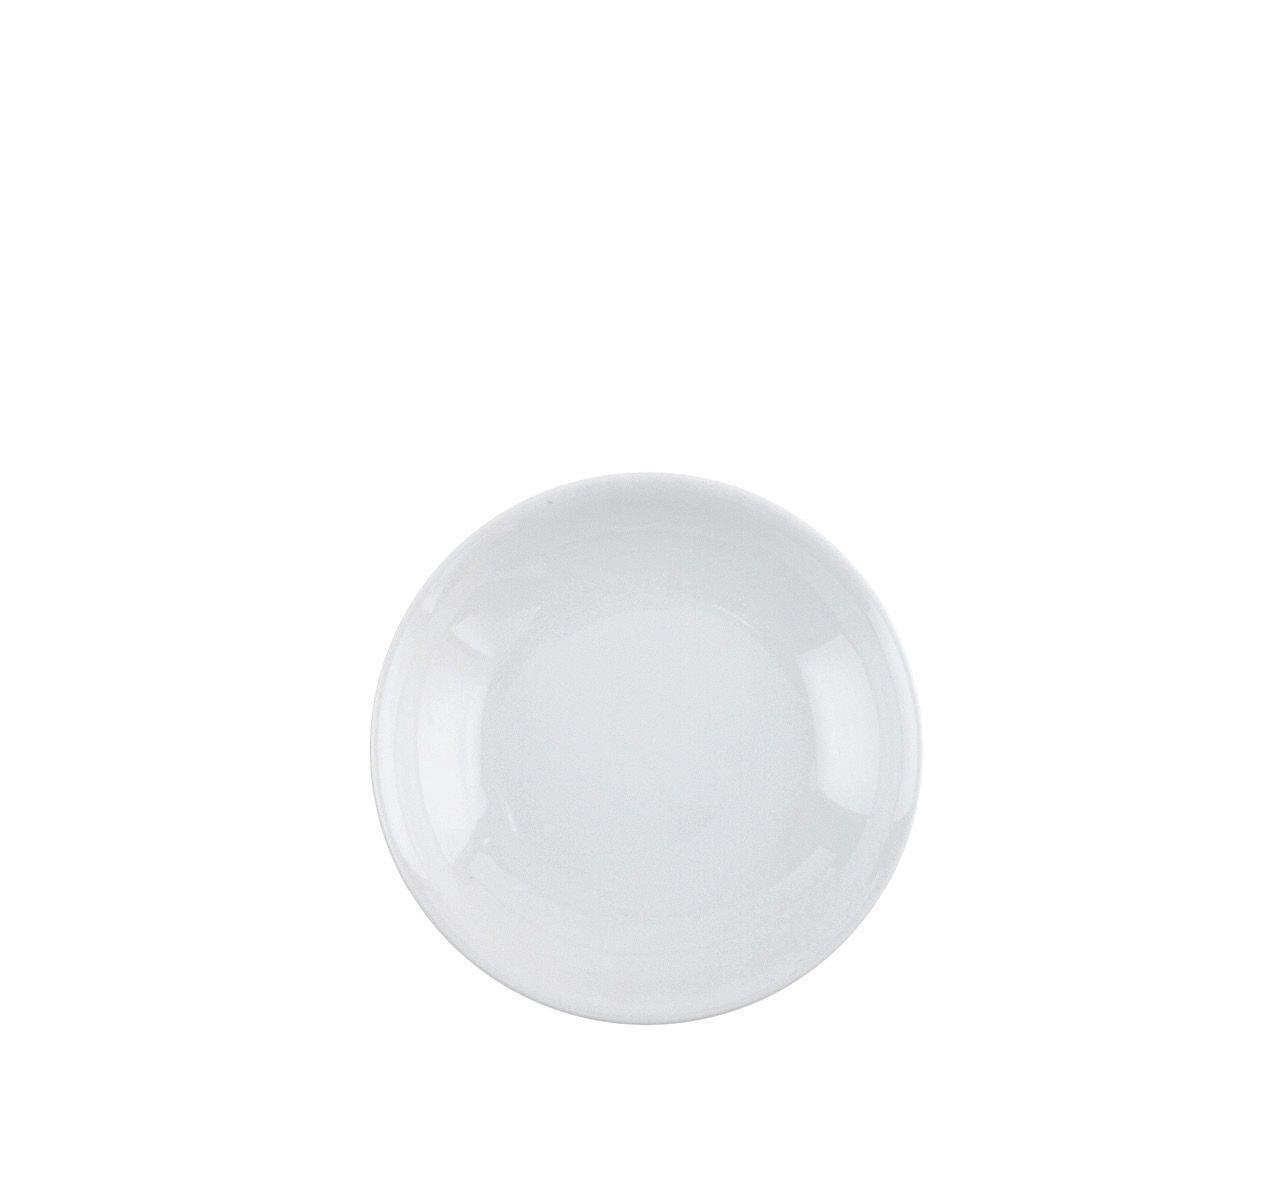 The White Snow - Round Serving Bowl 32.2